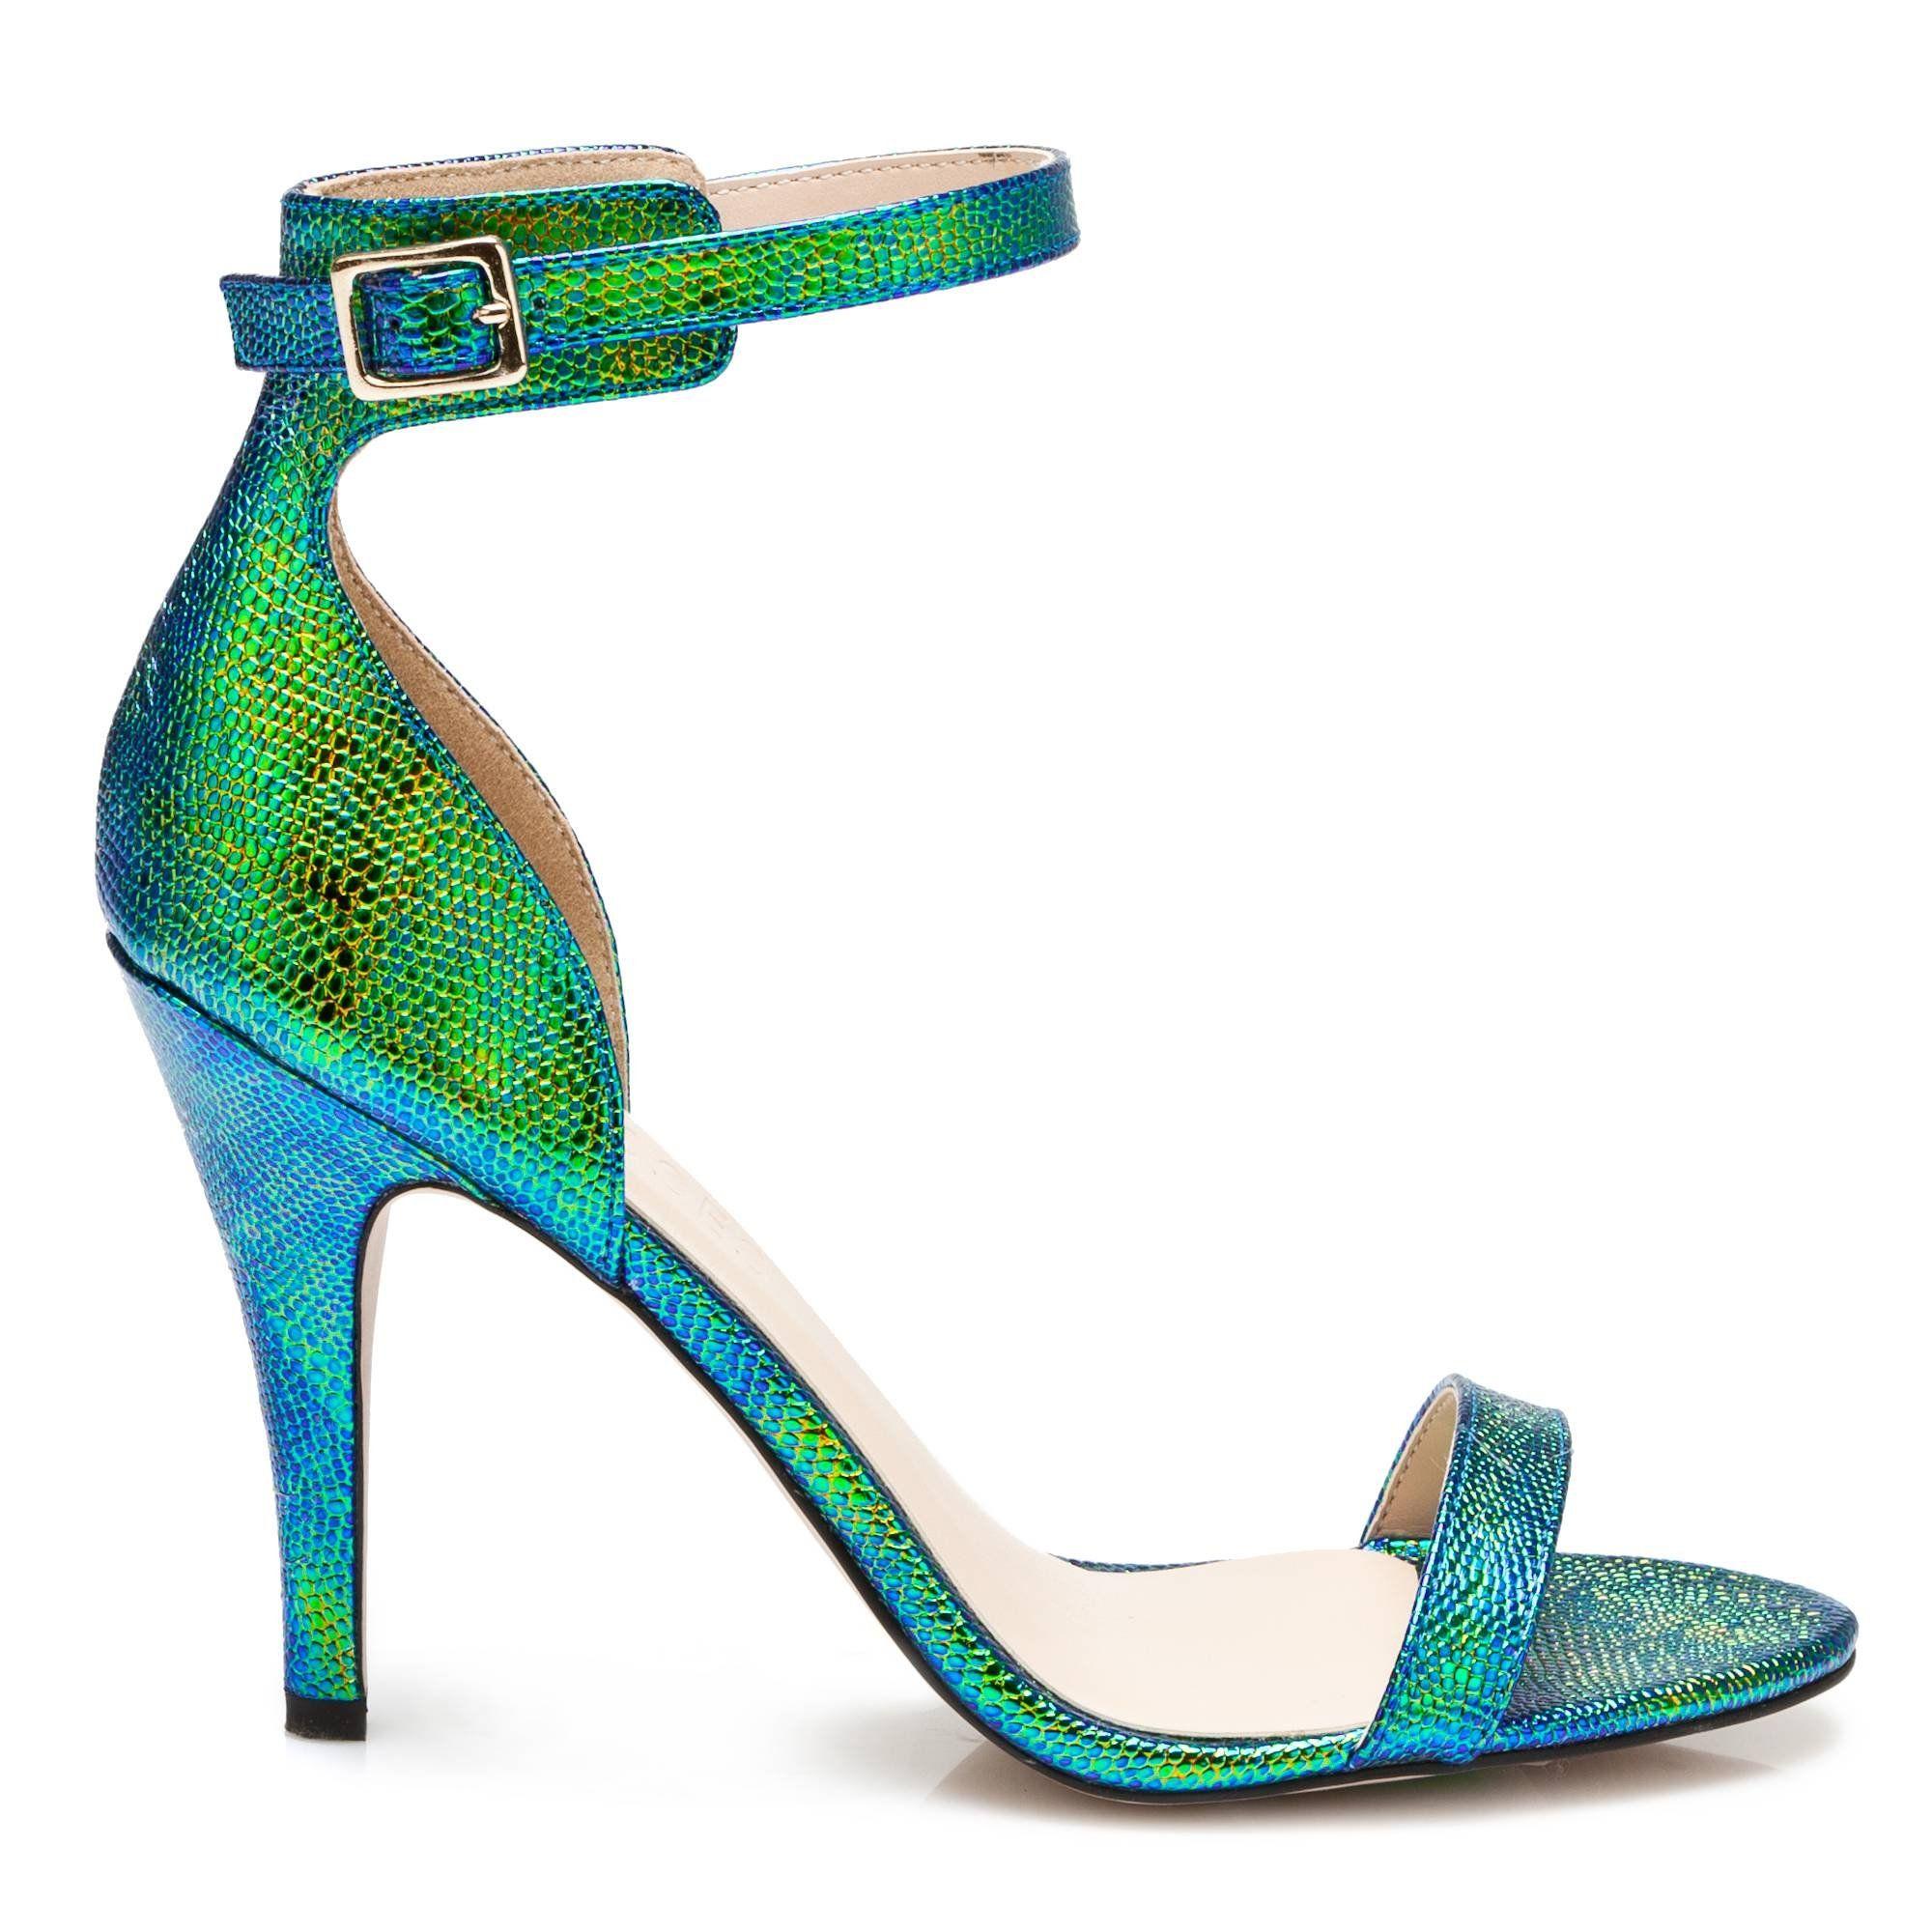 Sandales à talons en cuir imprimé reptileJonak sidkTn